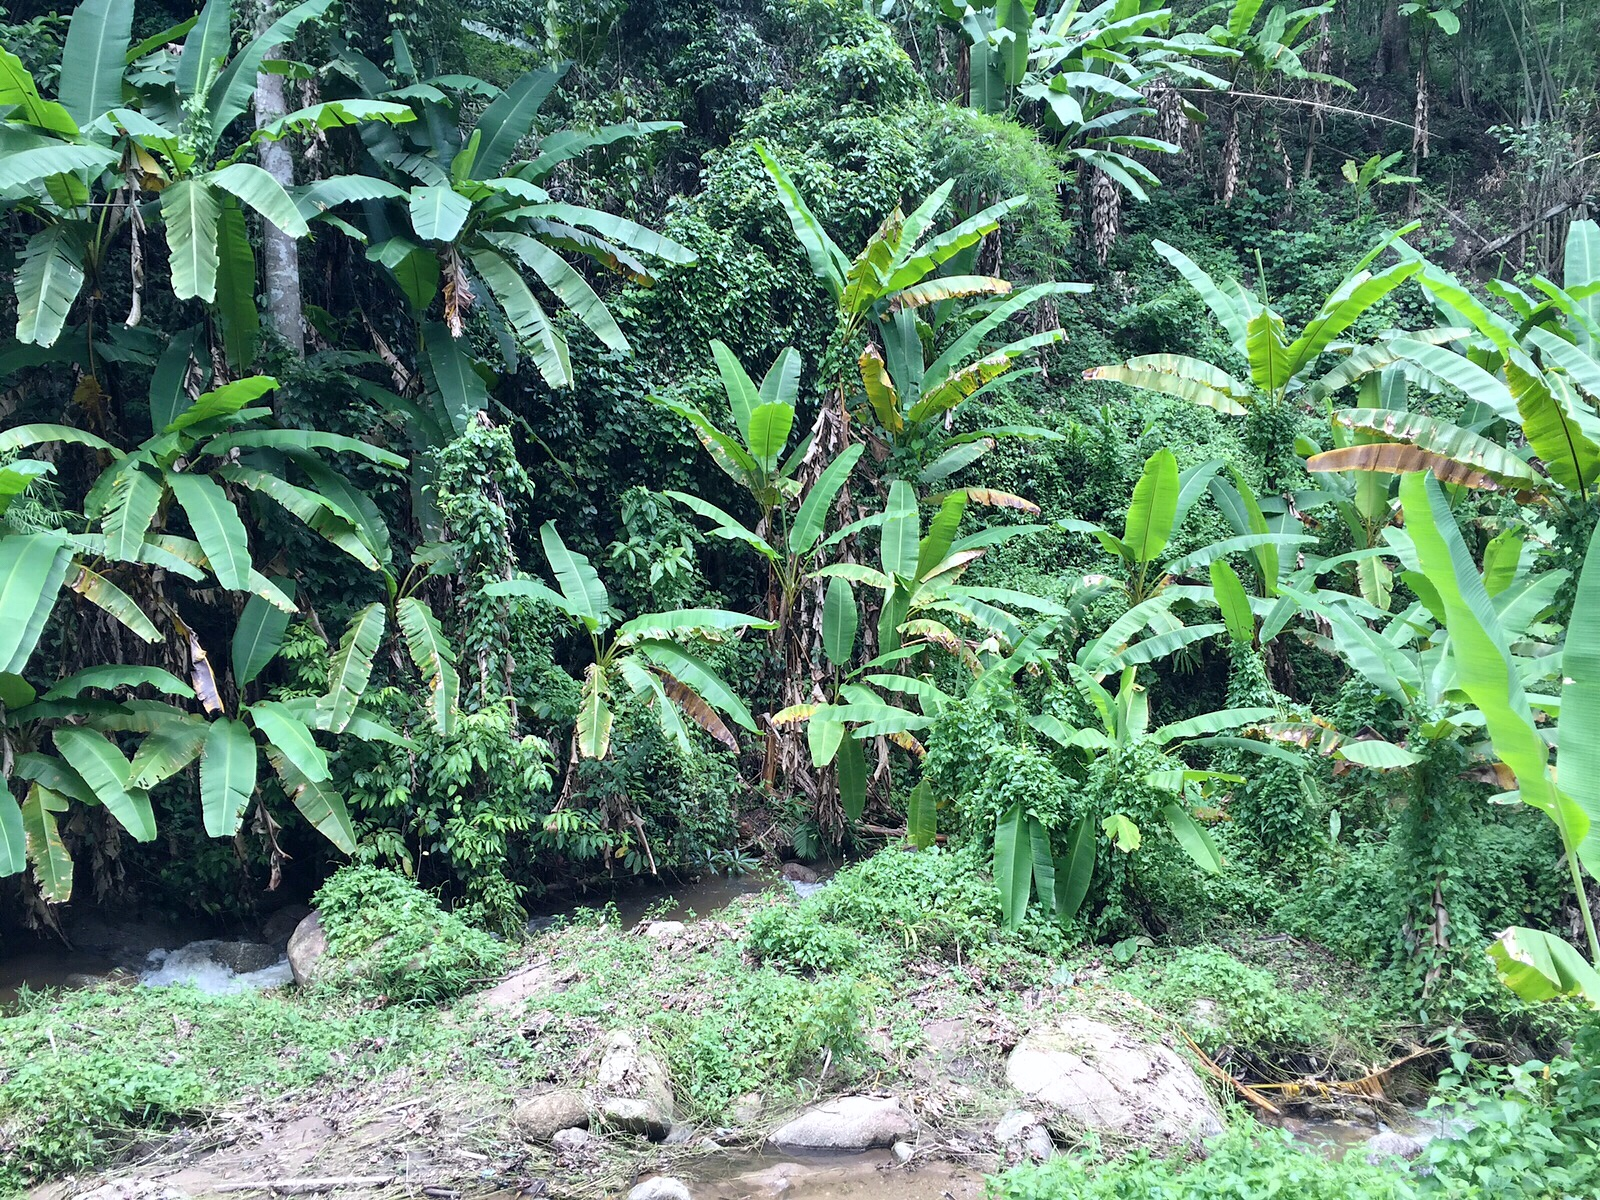 palm trees, jack fruit, banana trees and lianas